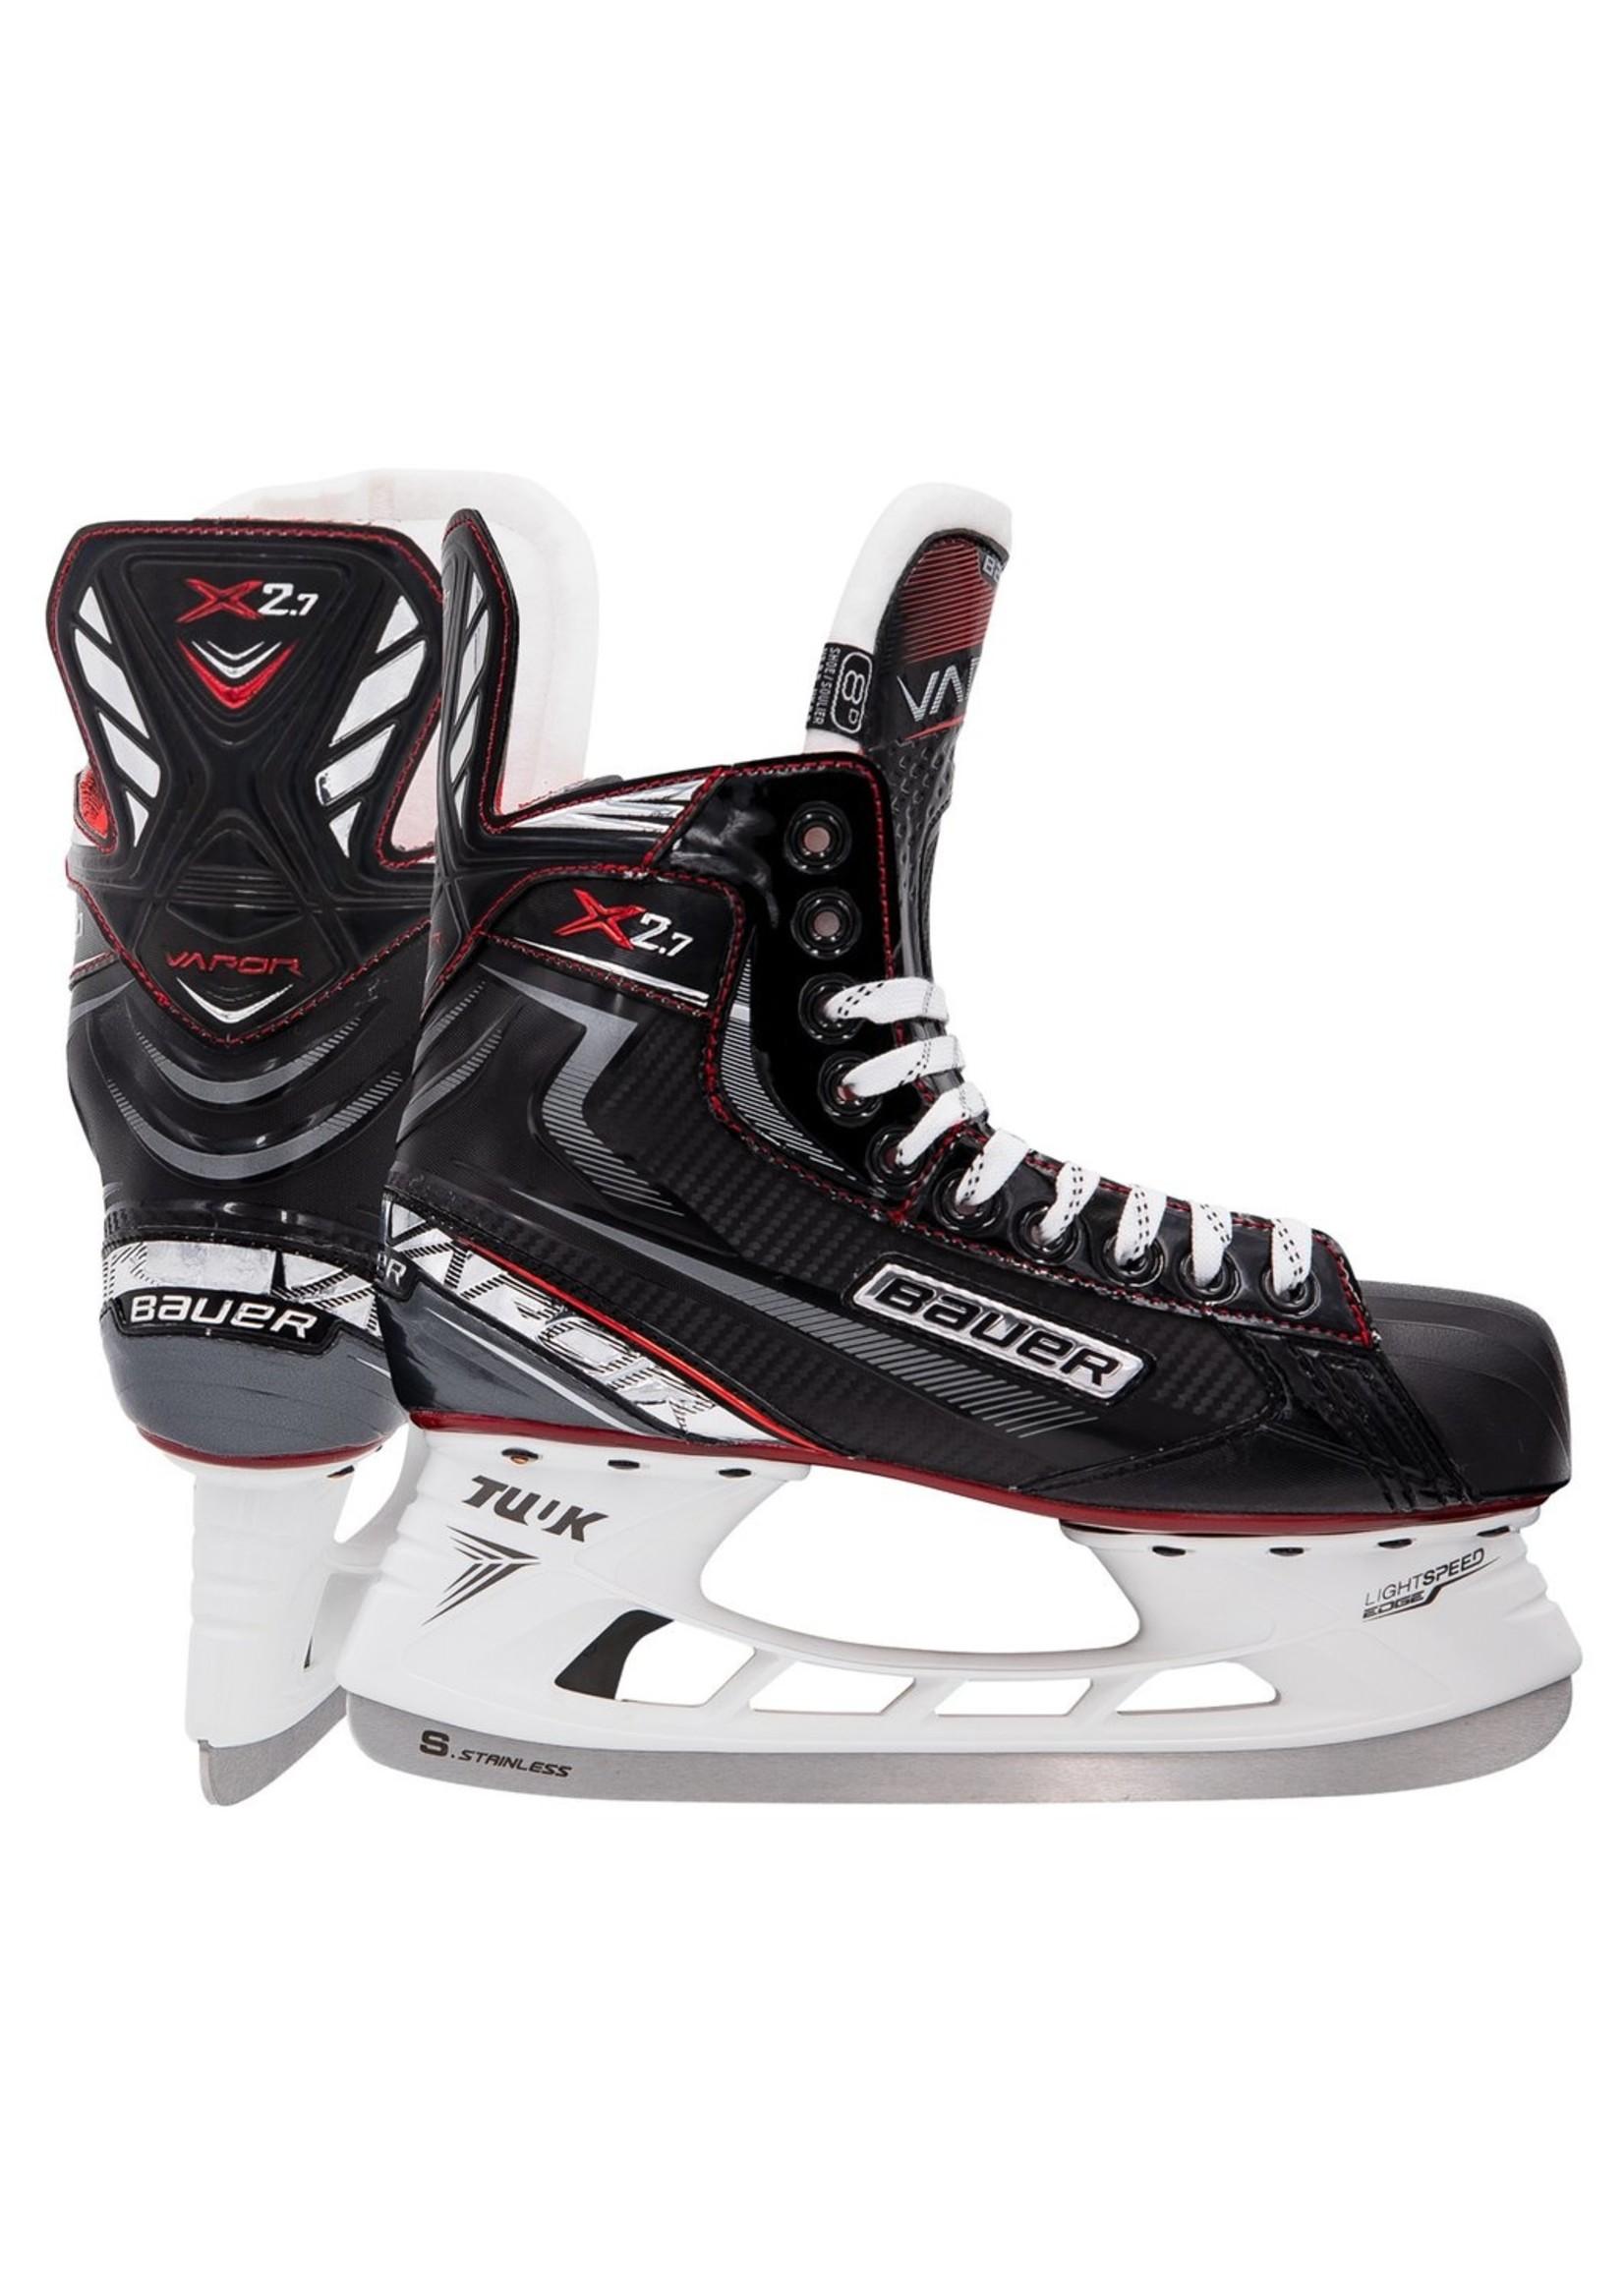 Bauer Hockey BAUER BTH19 VAPOR X2.7 JR PATINS